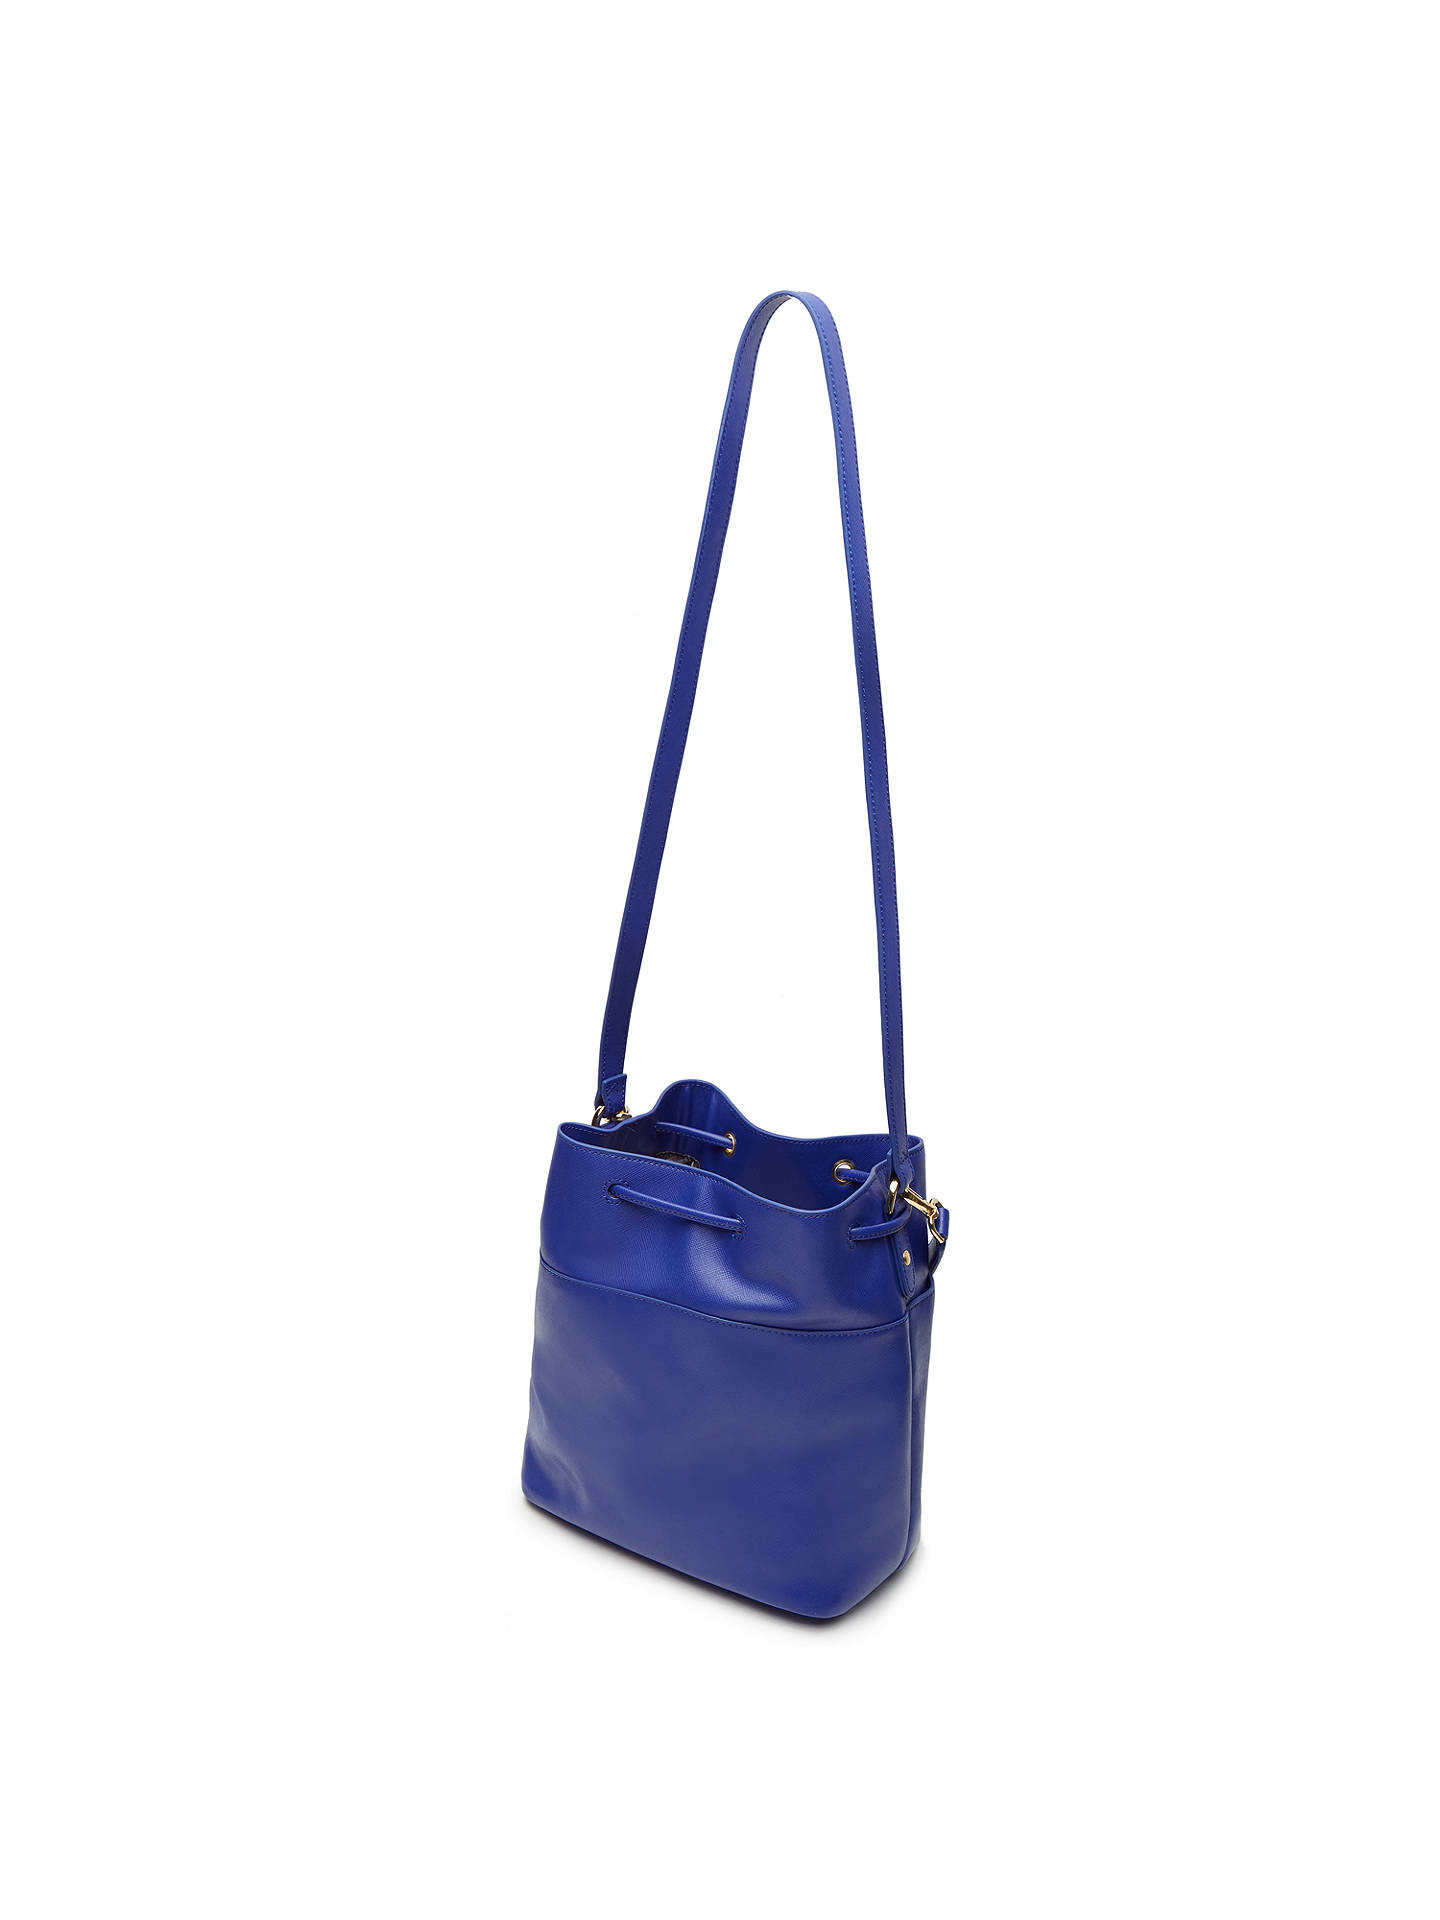 f270e9a4ceab8 Ted Baker Adrene Mini Bucket Leather Across Body Bag at John Lewis ...